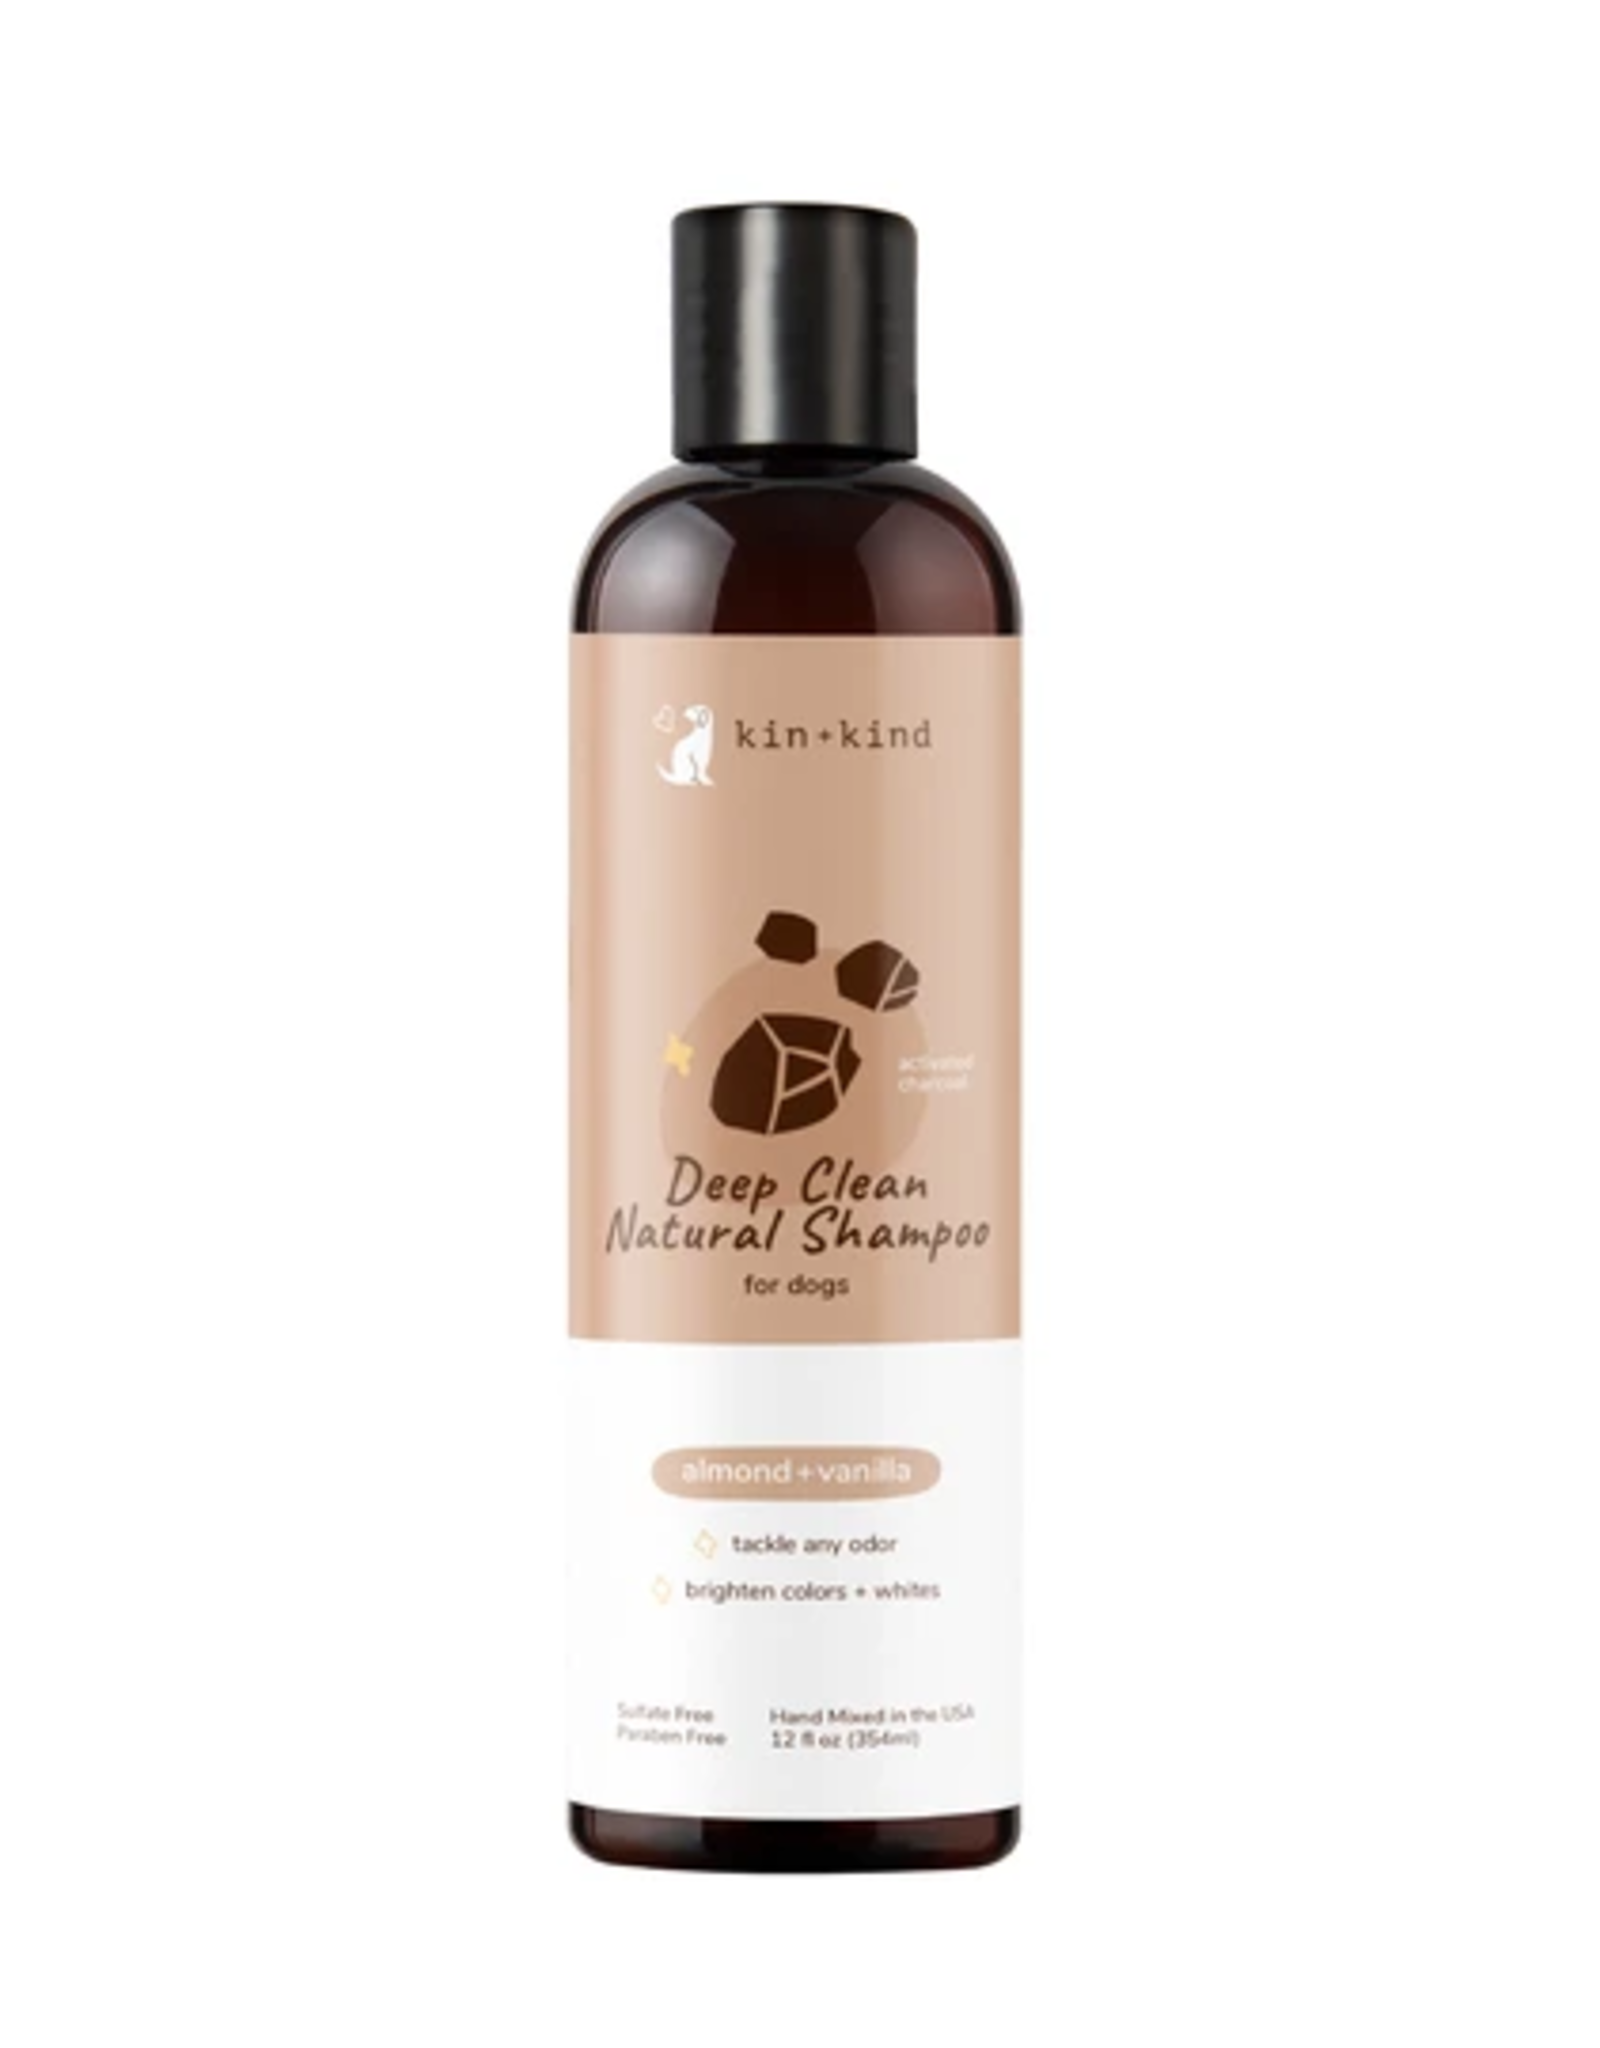 Kin+Kind Kin+Kind Deep Clean Shampoo (Almond+Vanilla) 12oz